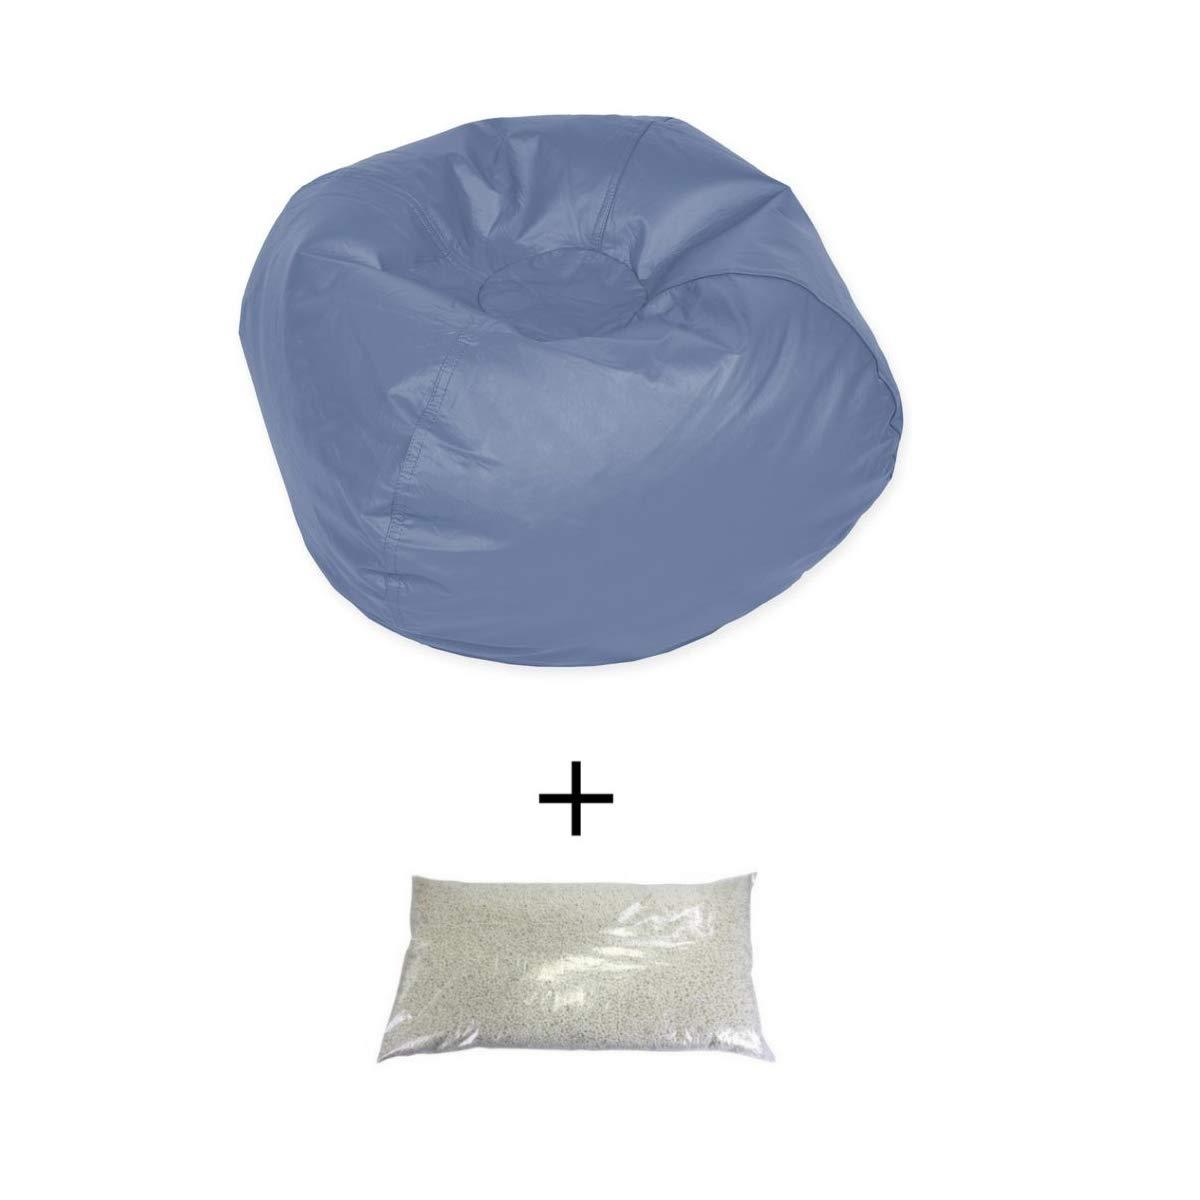 Amazon.com: Bean Bag Chair - Puf (tamaño grande, microfibra ...